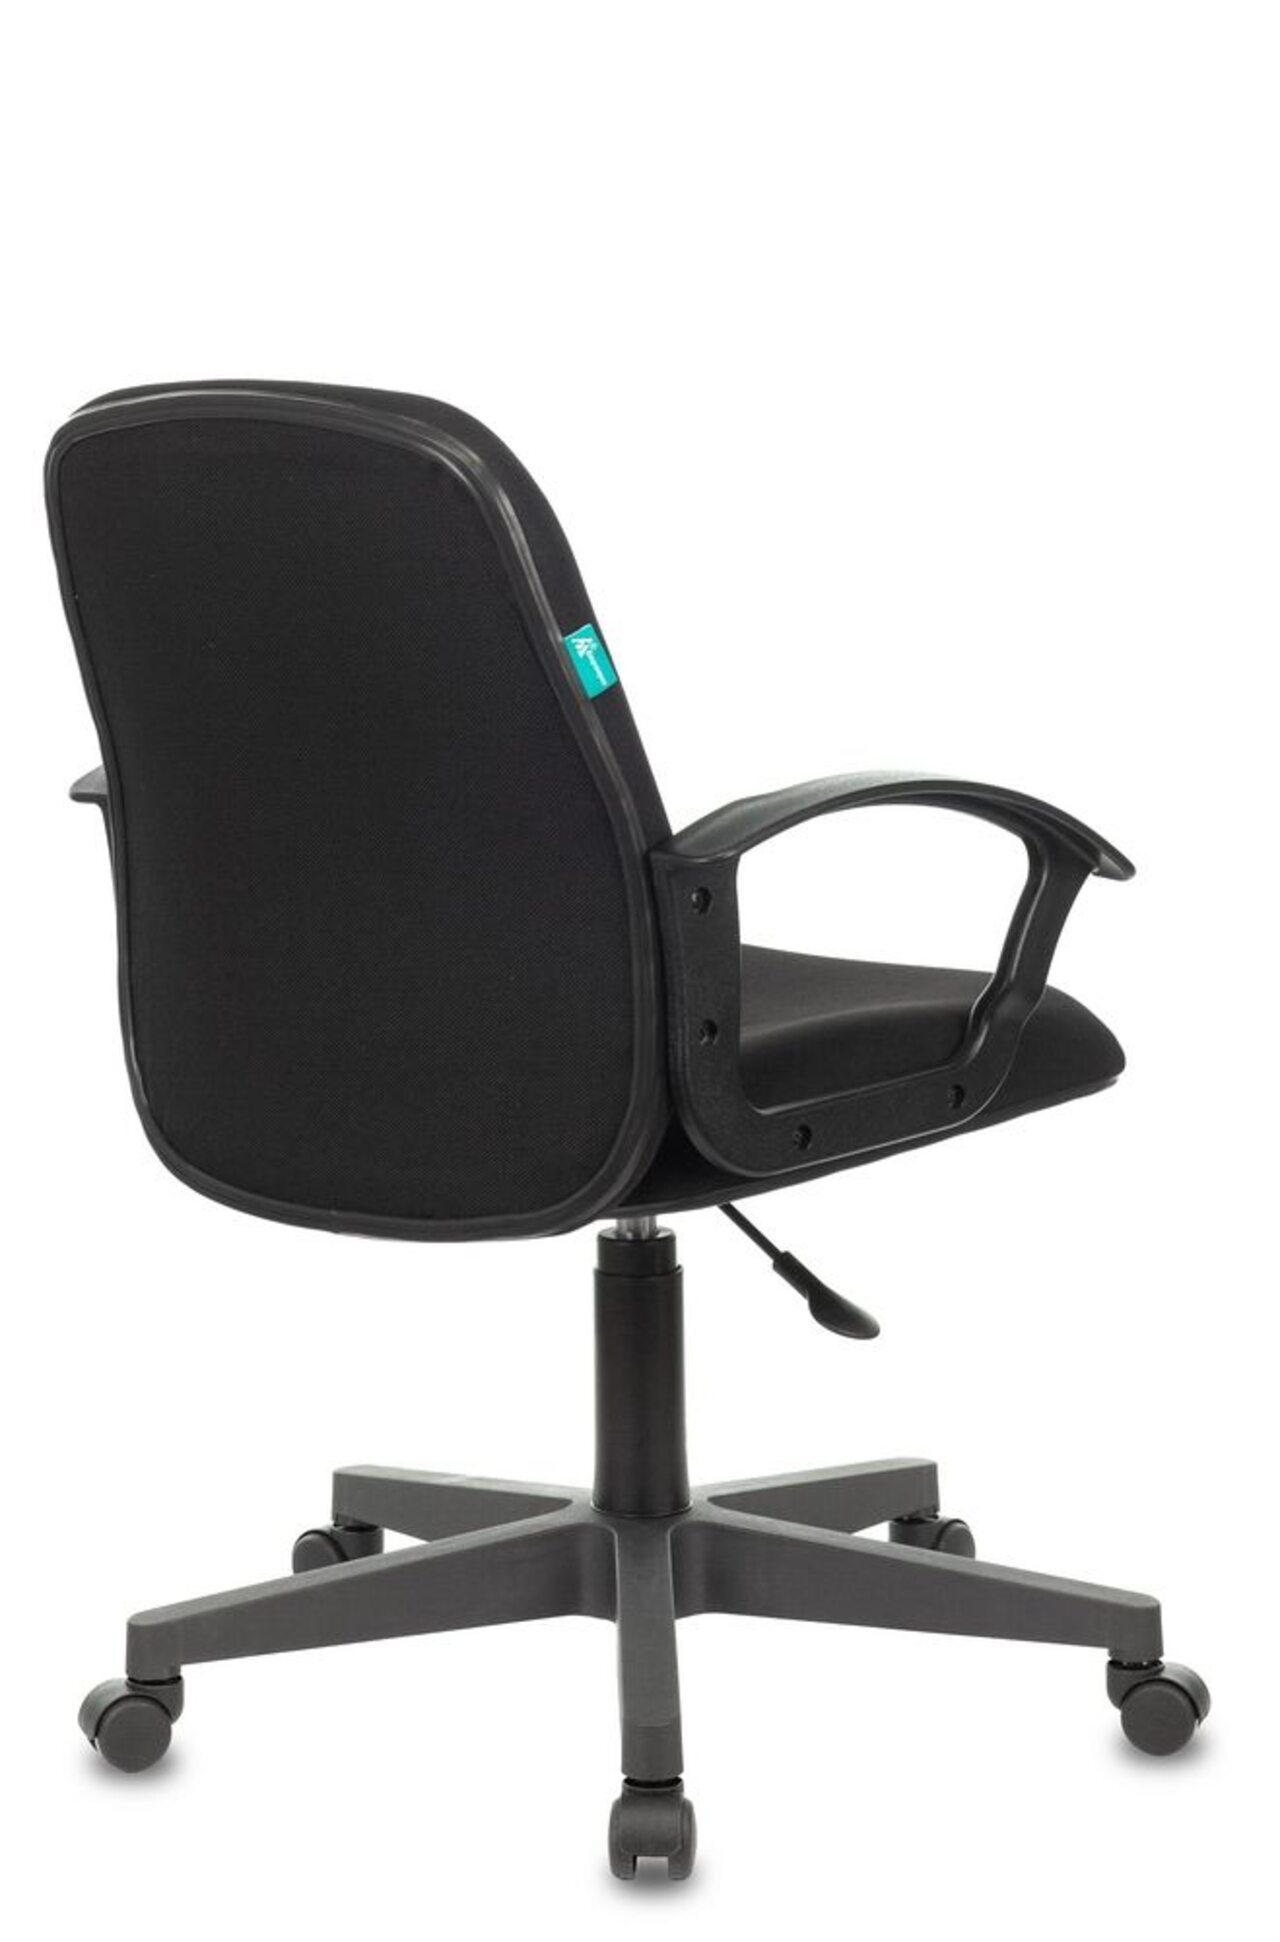 Кресло для персонала CH-808-LOW - фото 2